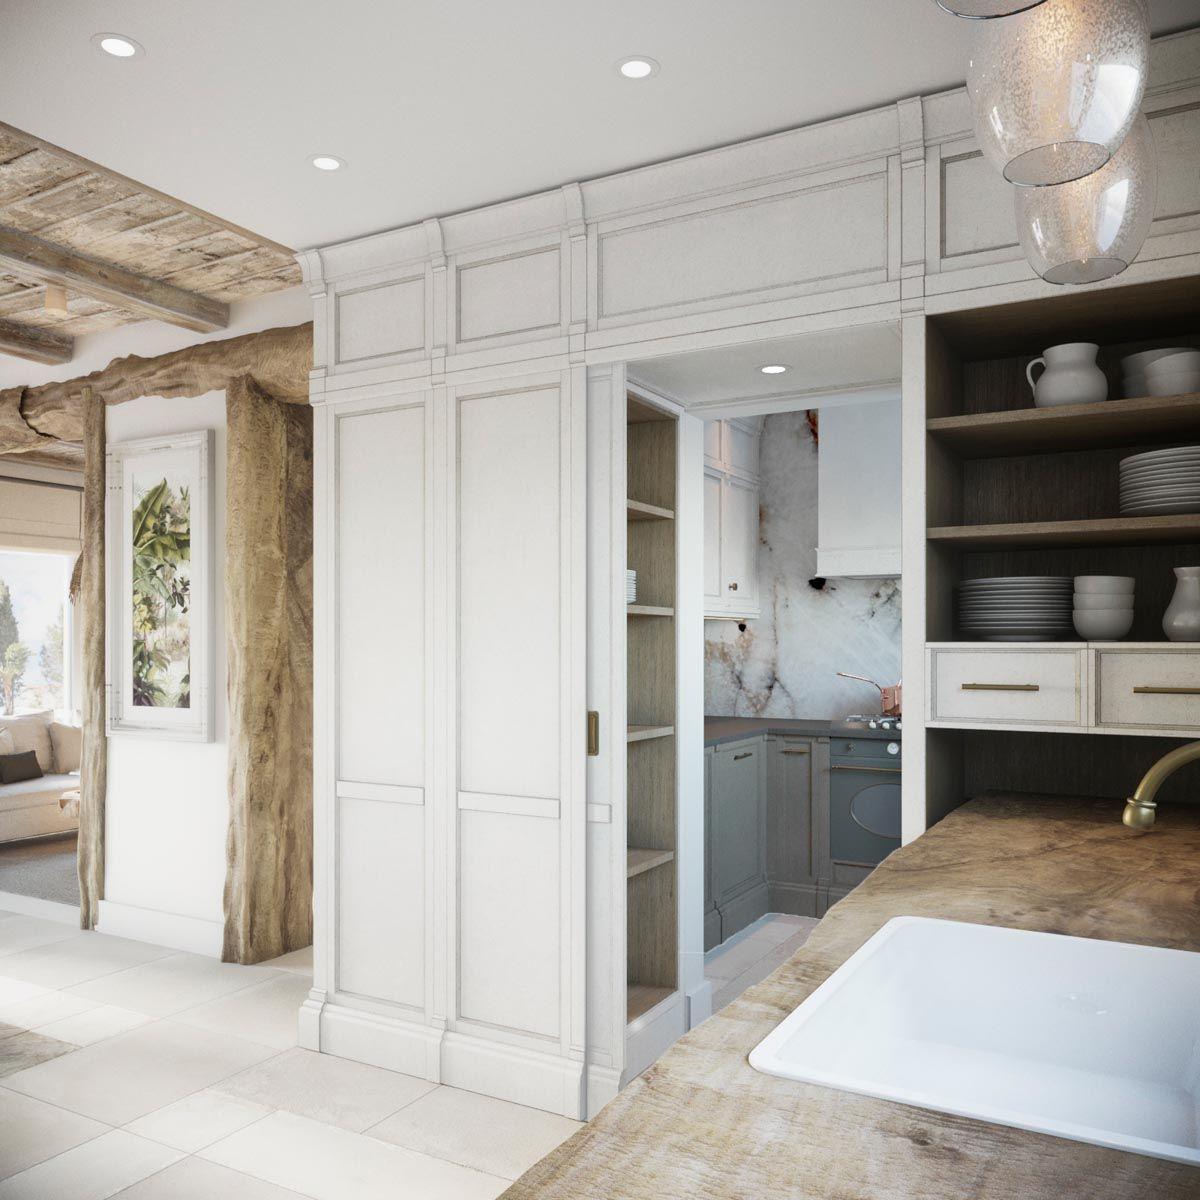 2 Homes in Mediterranean Rustic Chic | kuchnia | Pinterest | Rustic ...